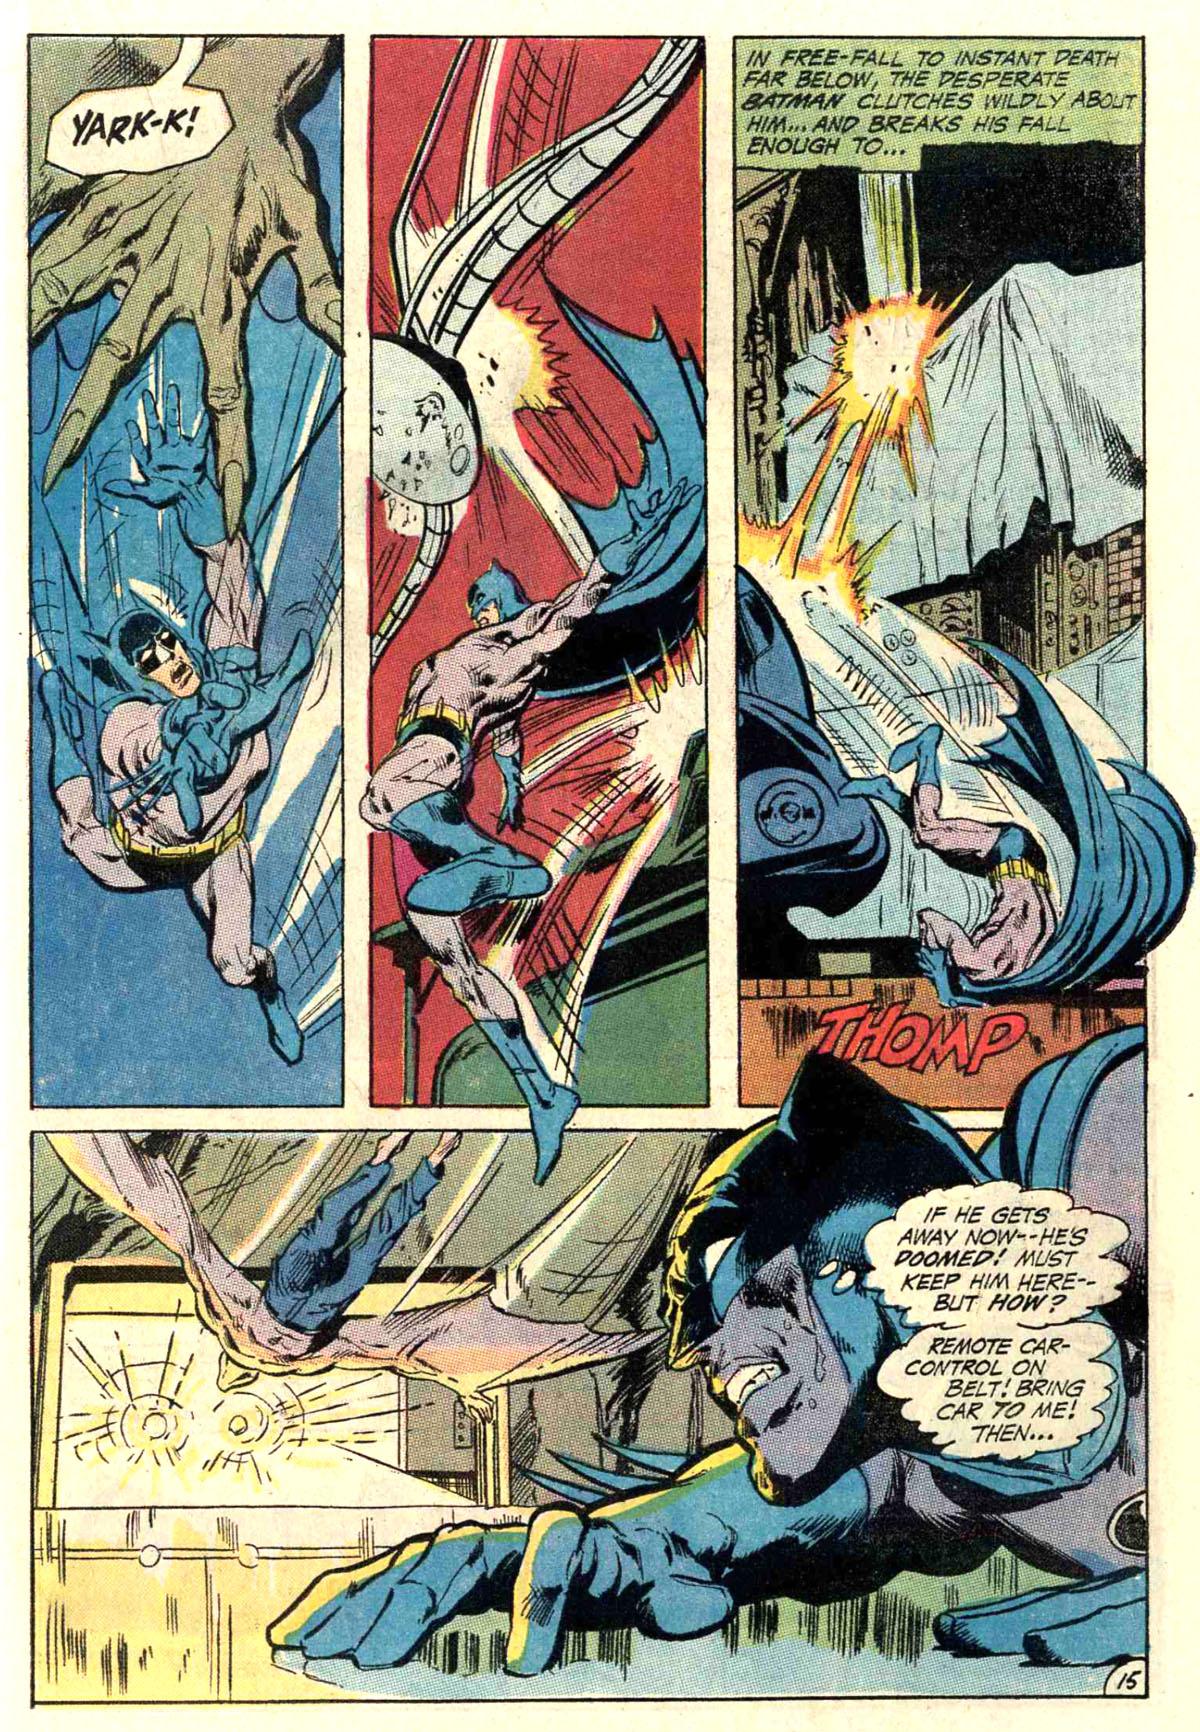 Detective Comics (1937) 402 Page 18